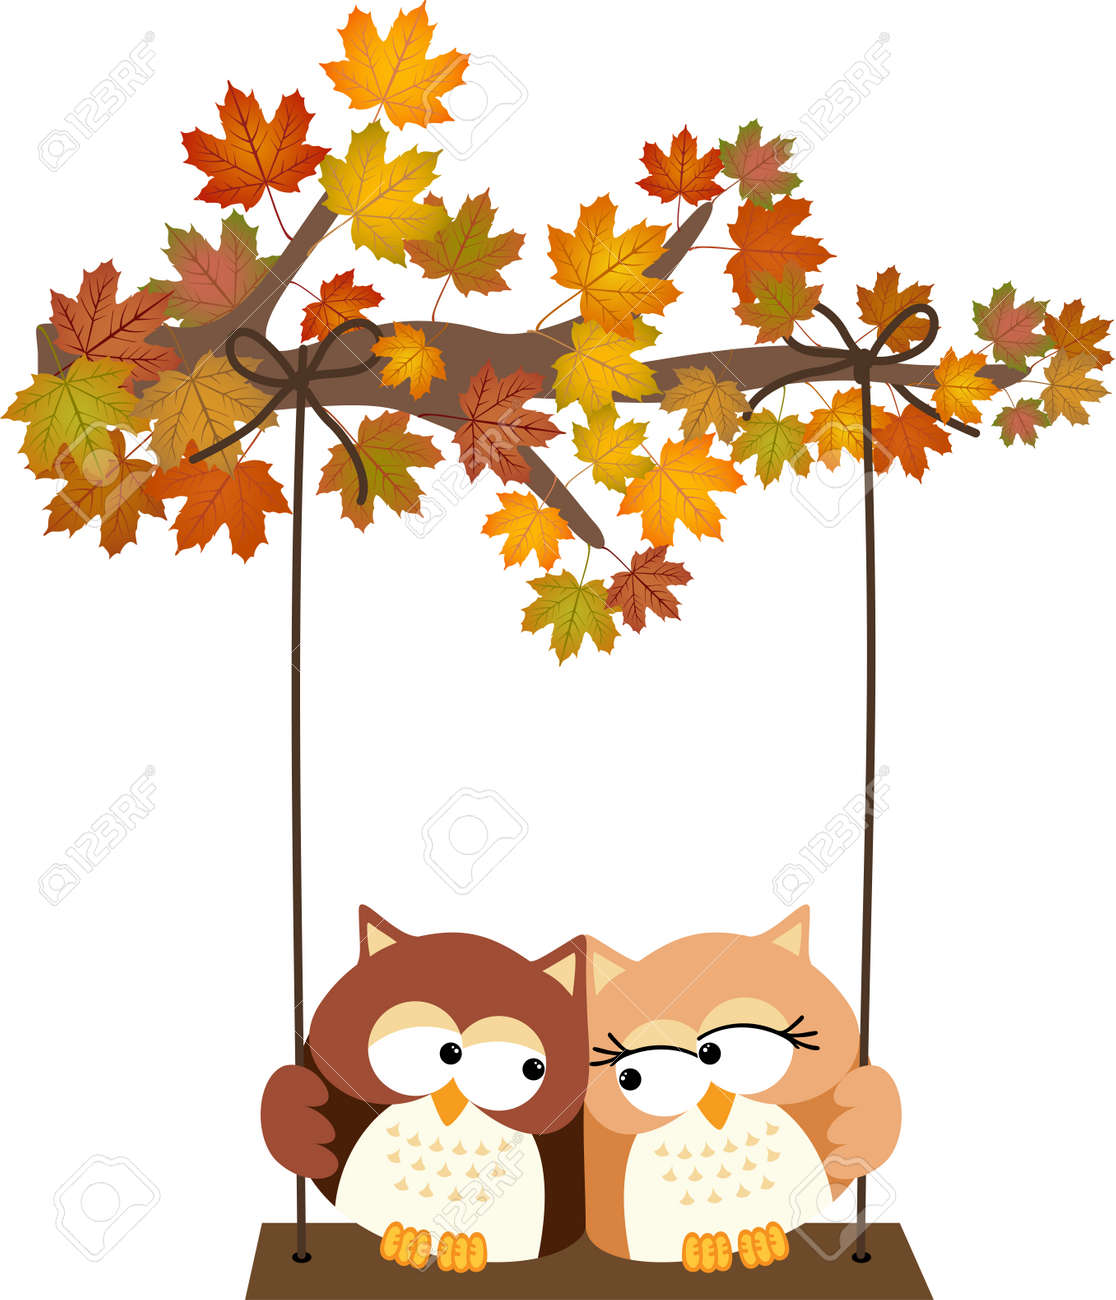 Fall tree cartoon images — img 2